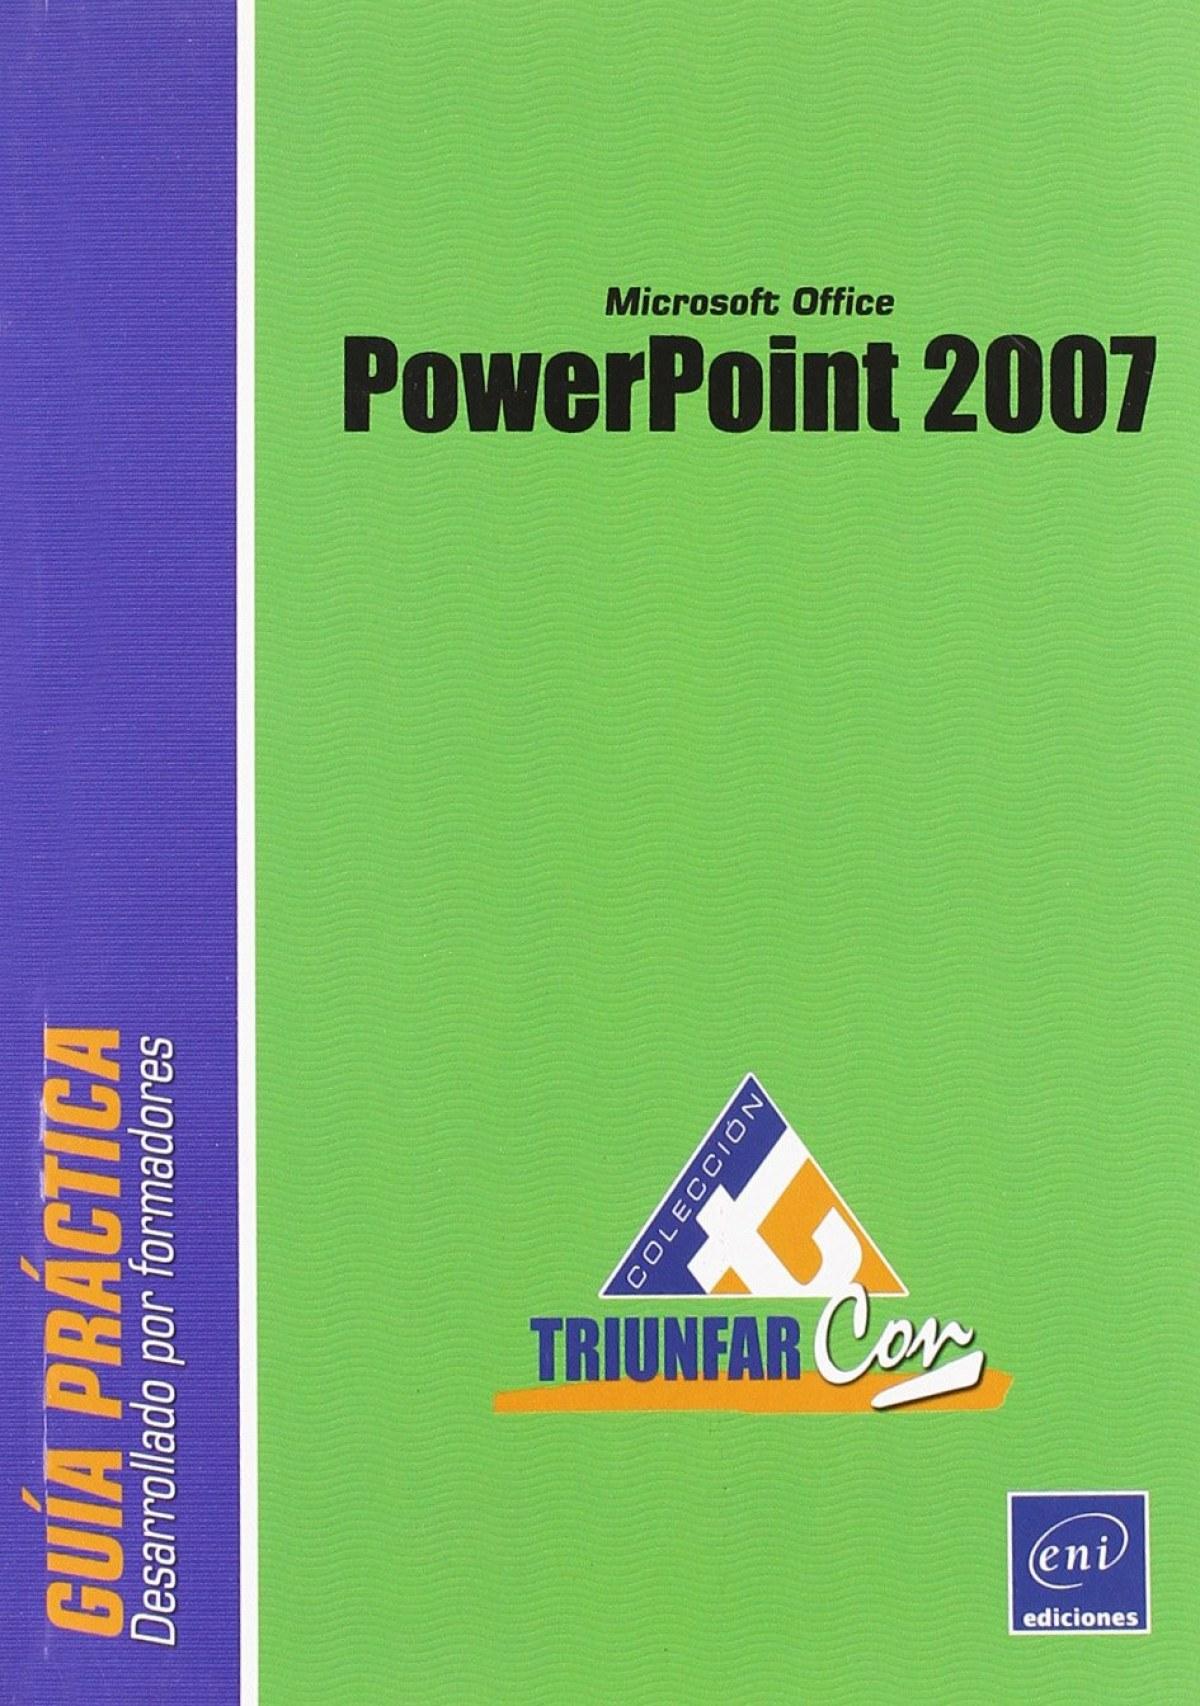 Triunfar Con POWERPOINT 2007